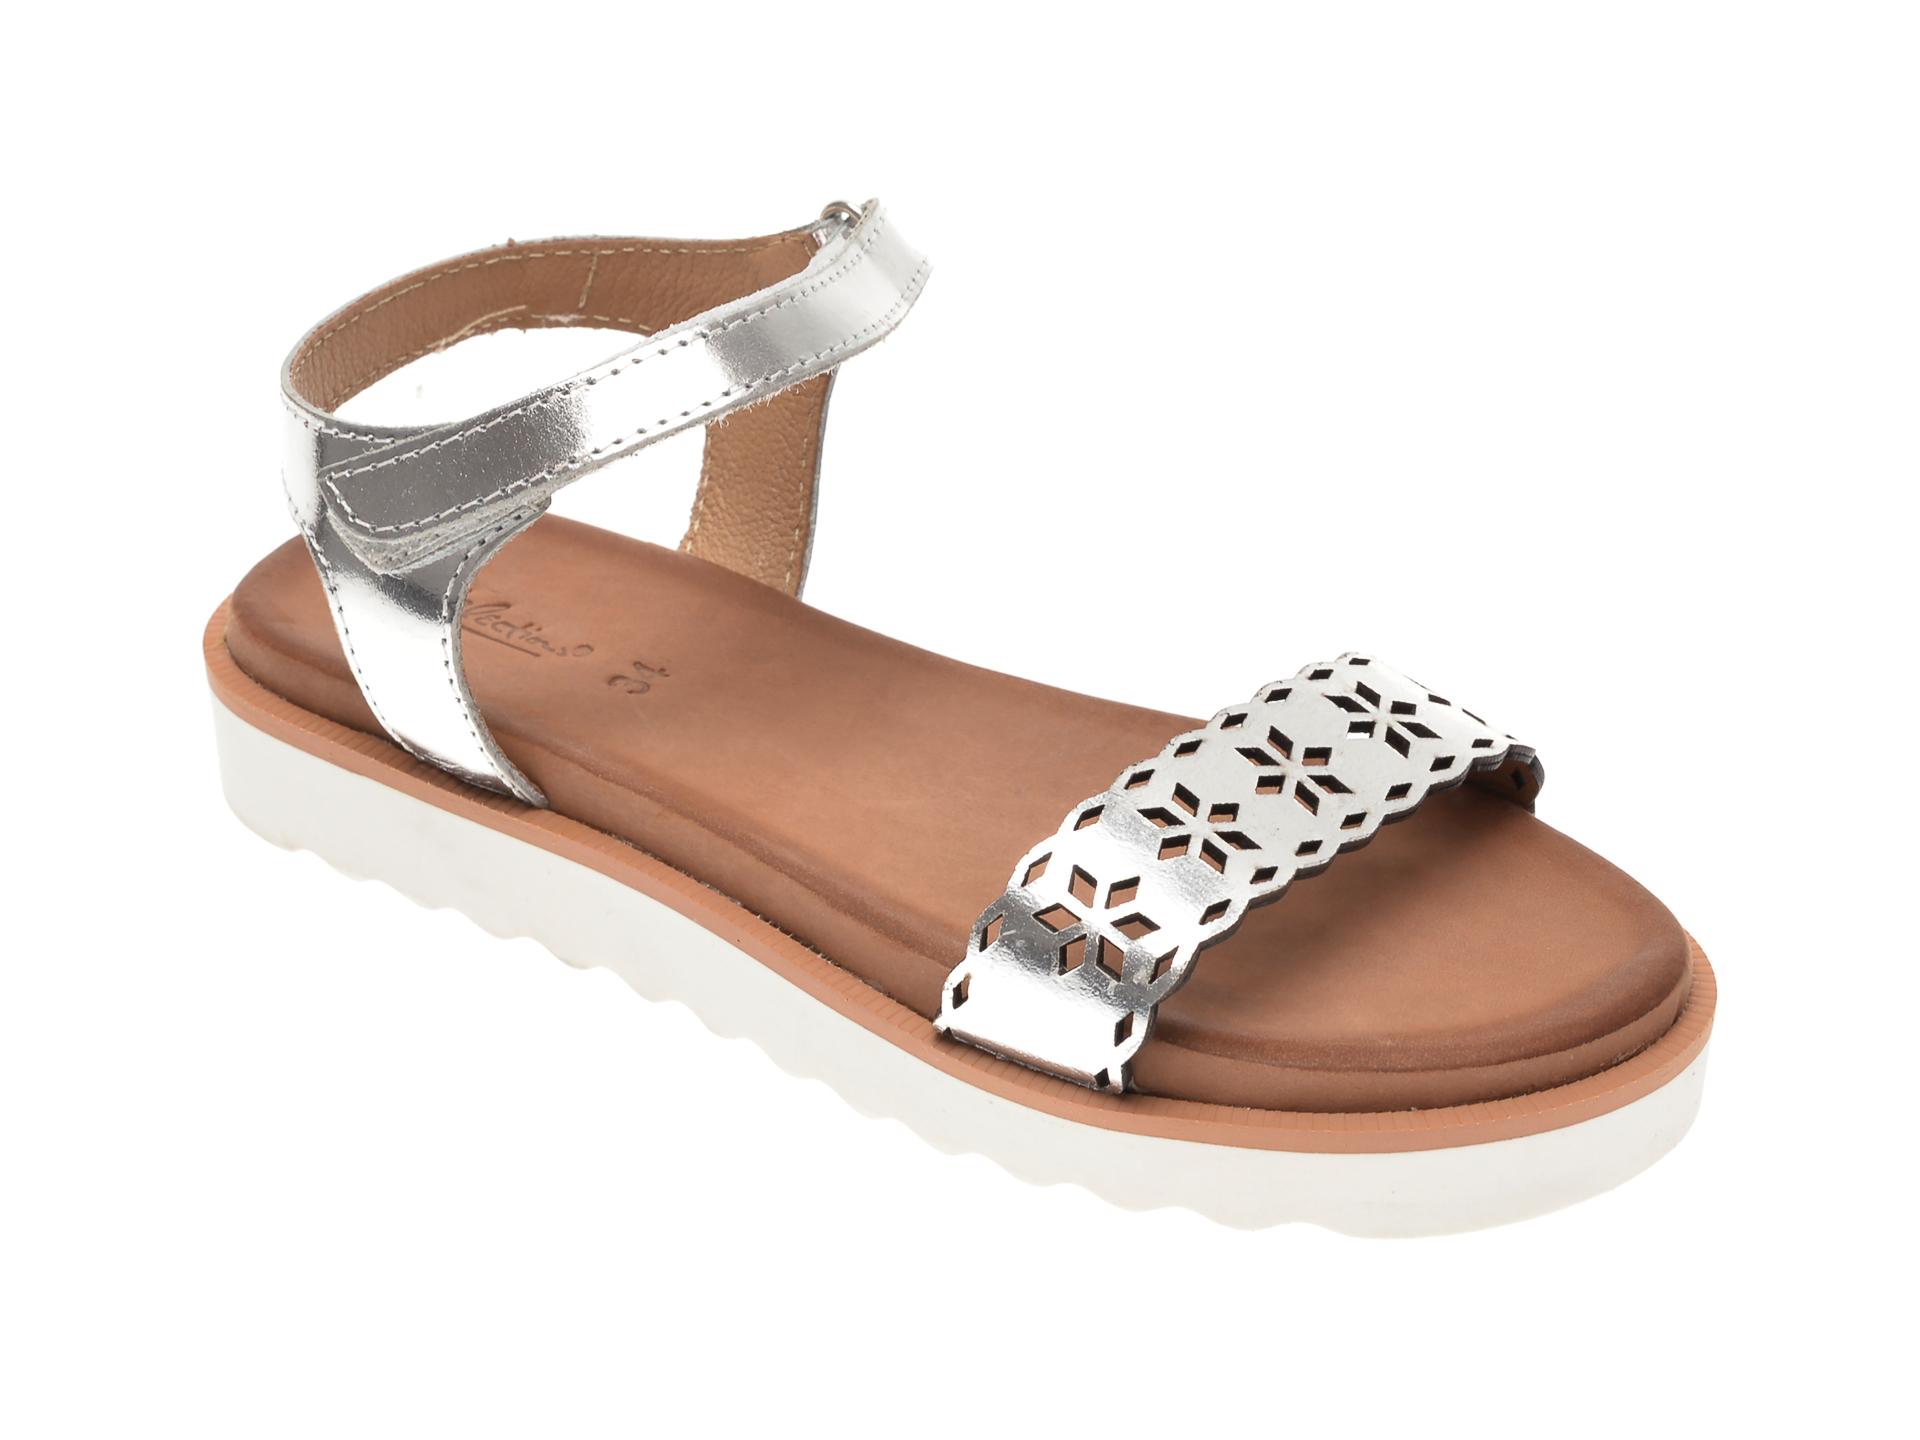 Sandale SELECTION KIDS argintii, SH17, din piele naturala